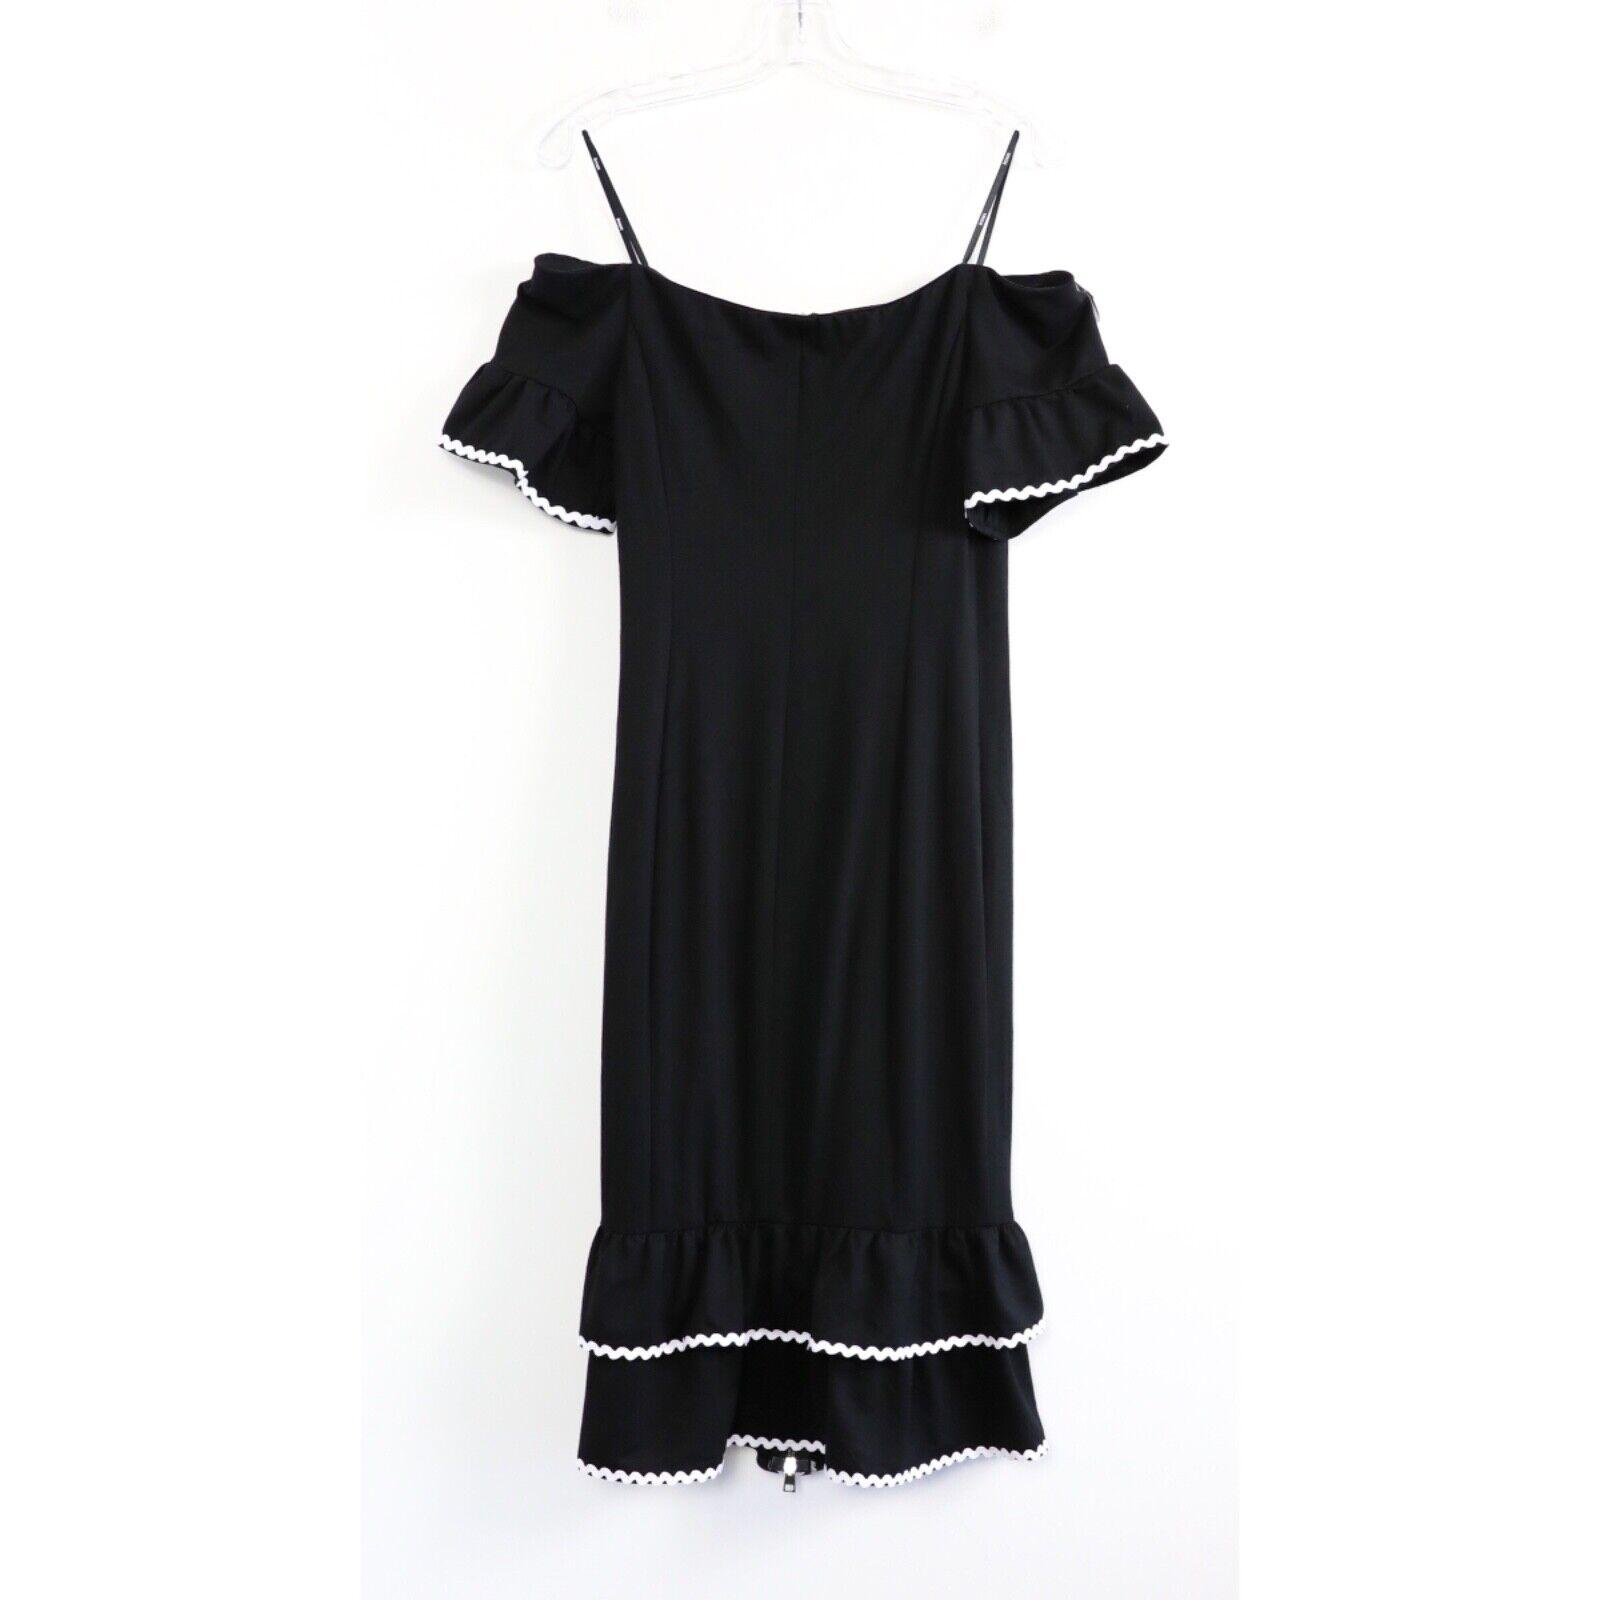 Tenax little black dress form fitting front zip 5… - image 3